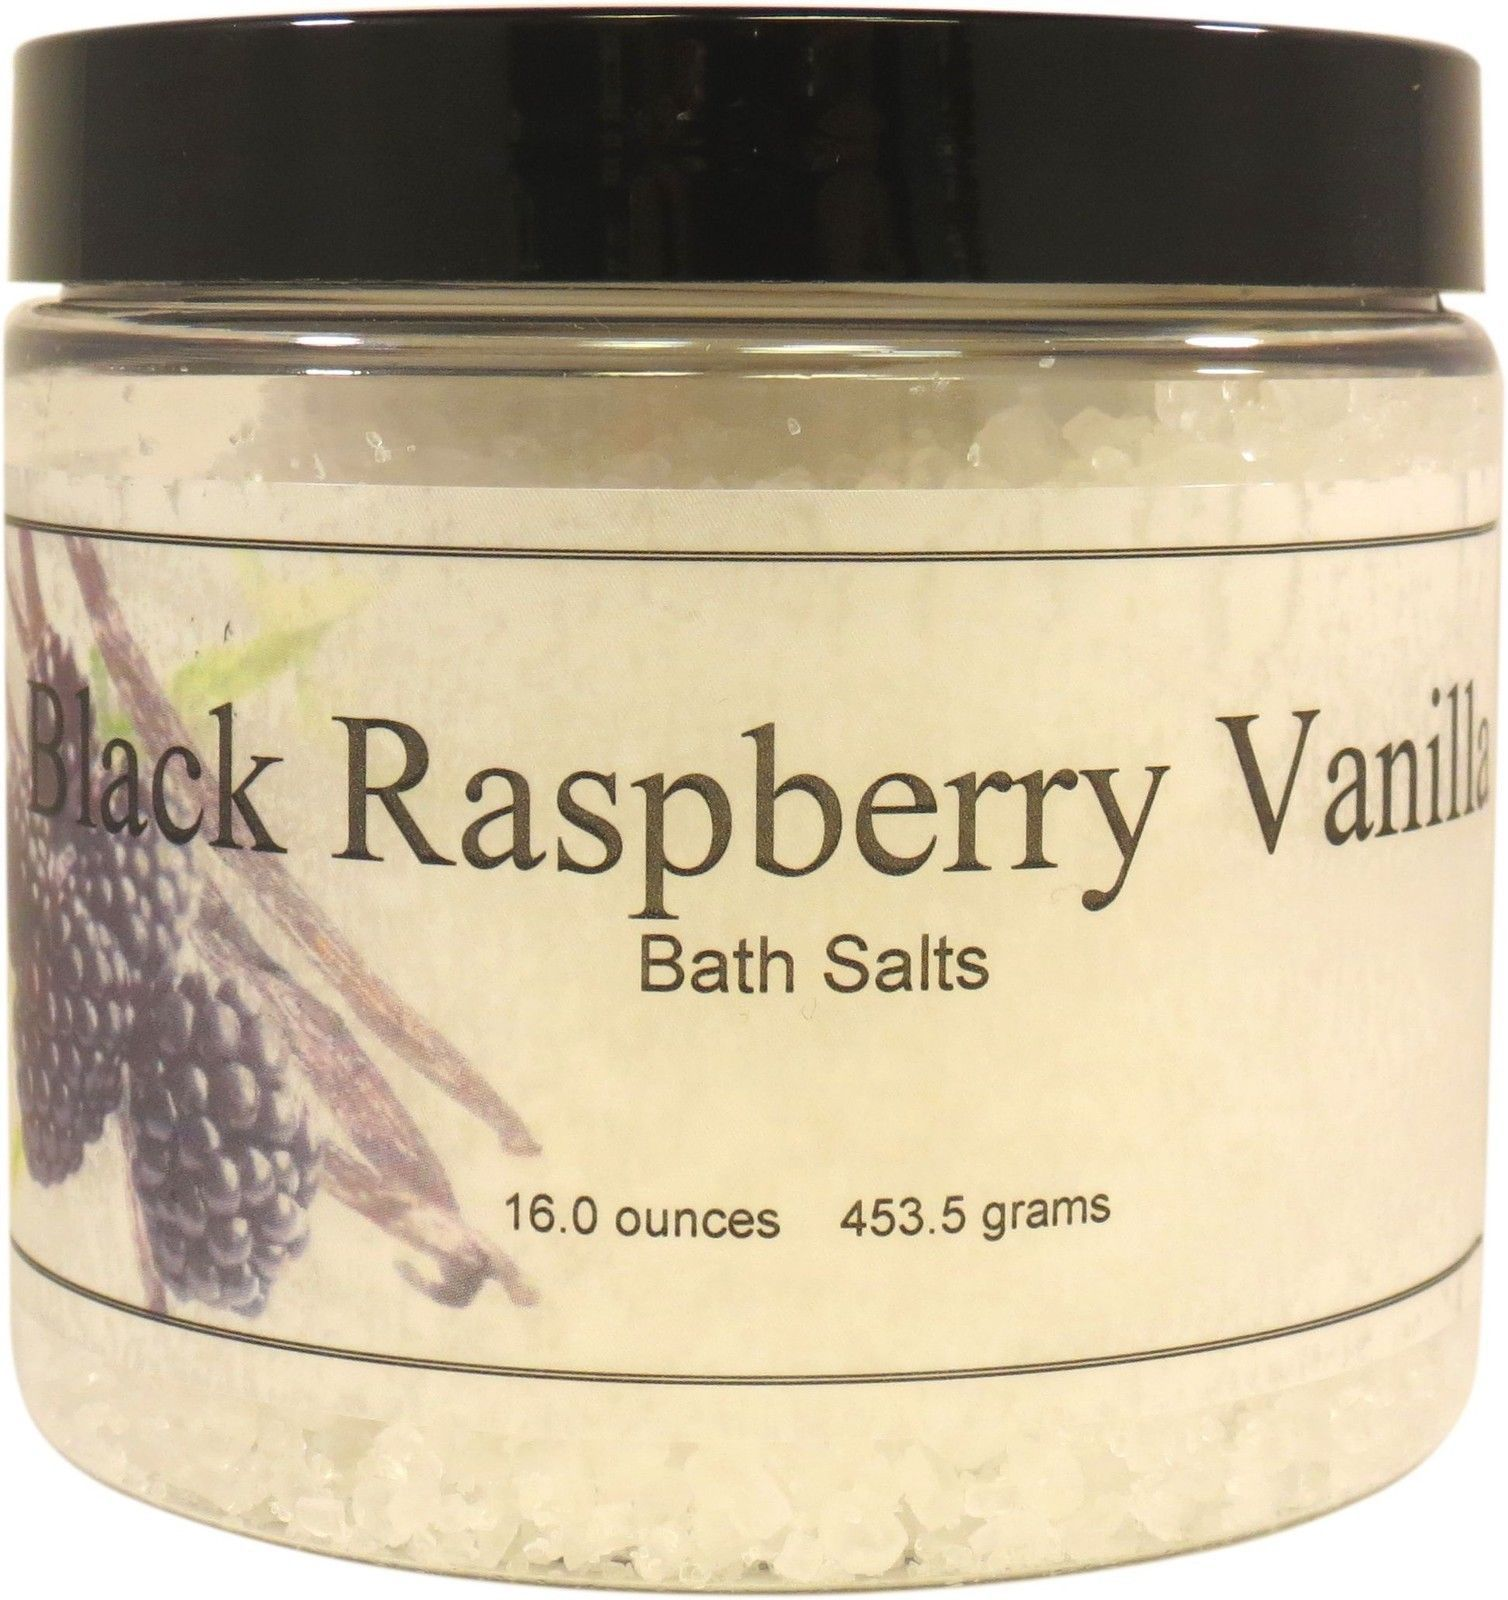 Black Raspberry Vanilla Bath Salts